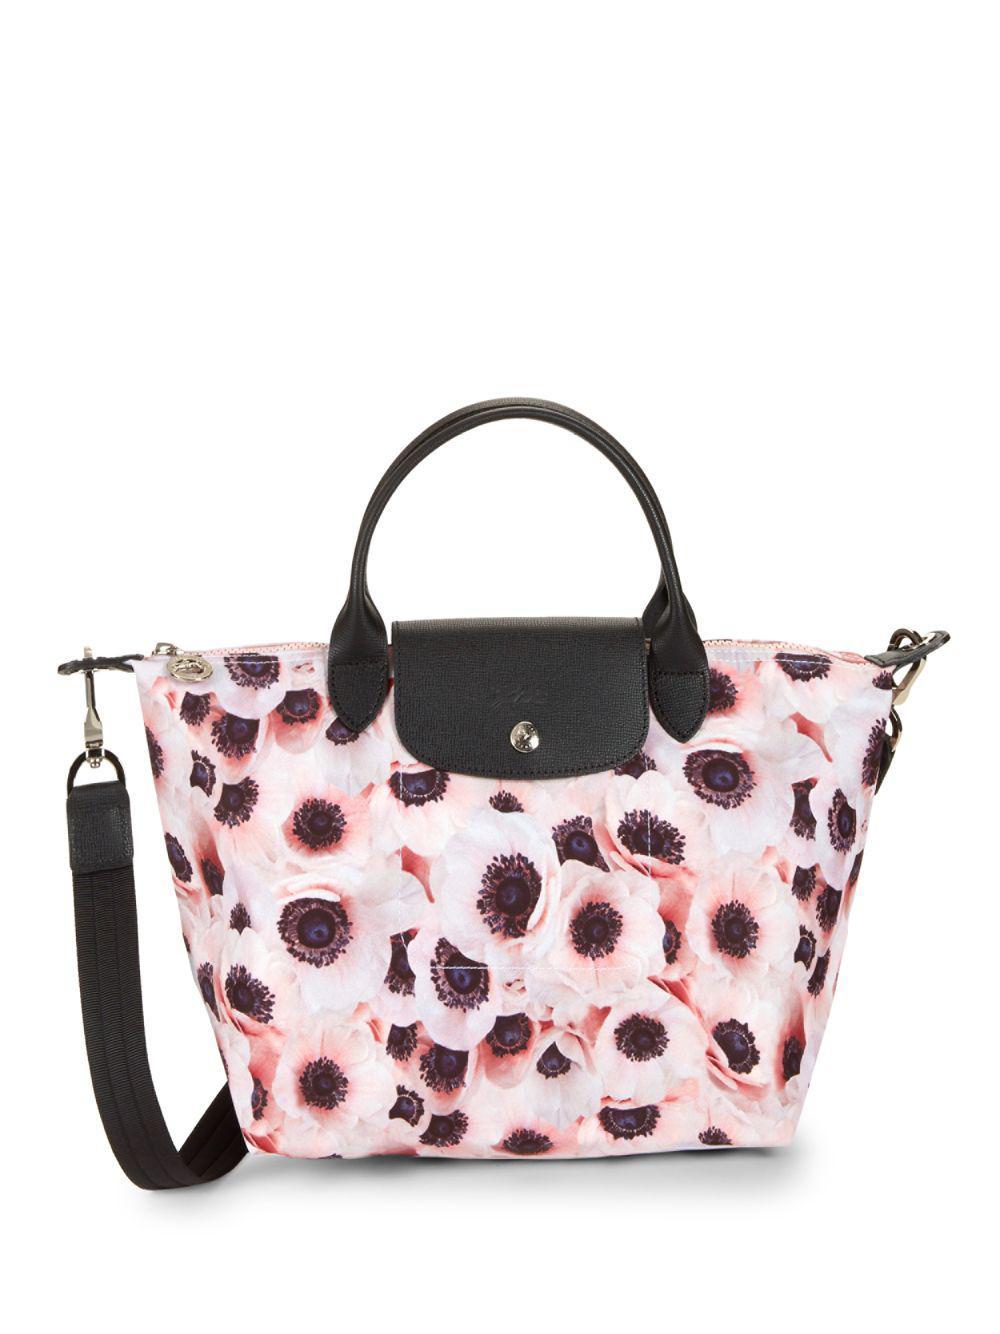 ba382148c900d Longchamp Le Pliage Anemone Tote Bag in Pink - Lyst